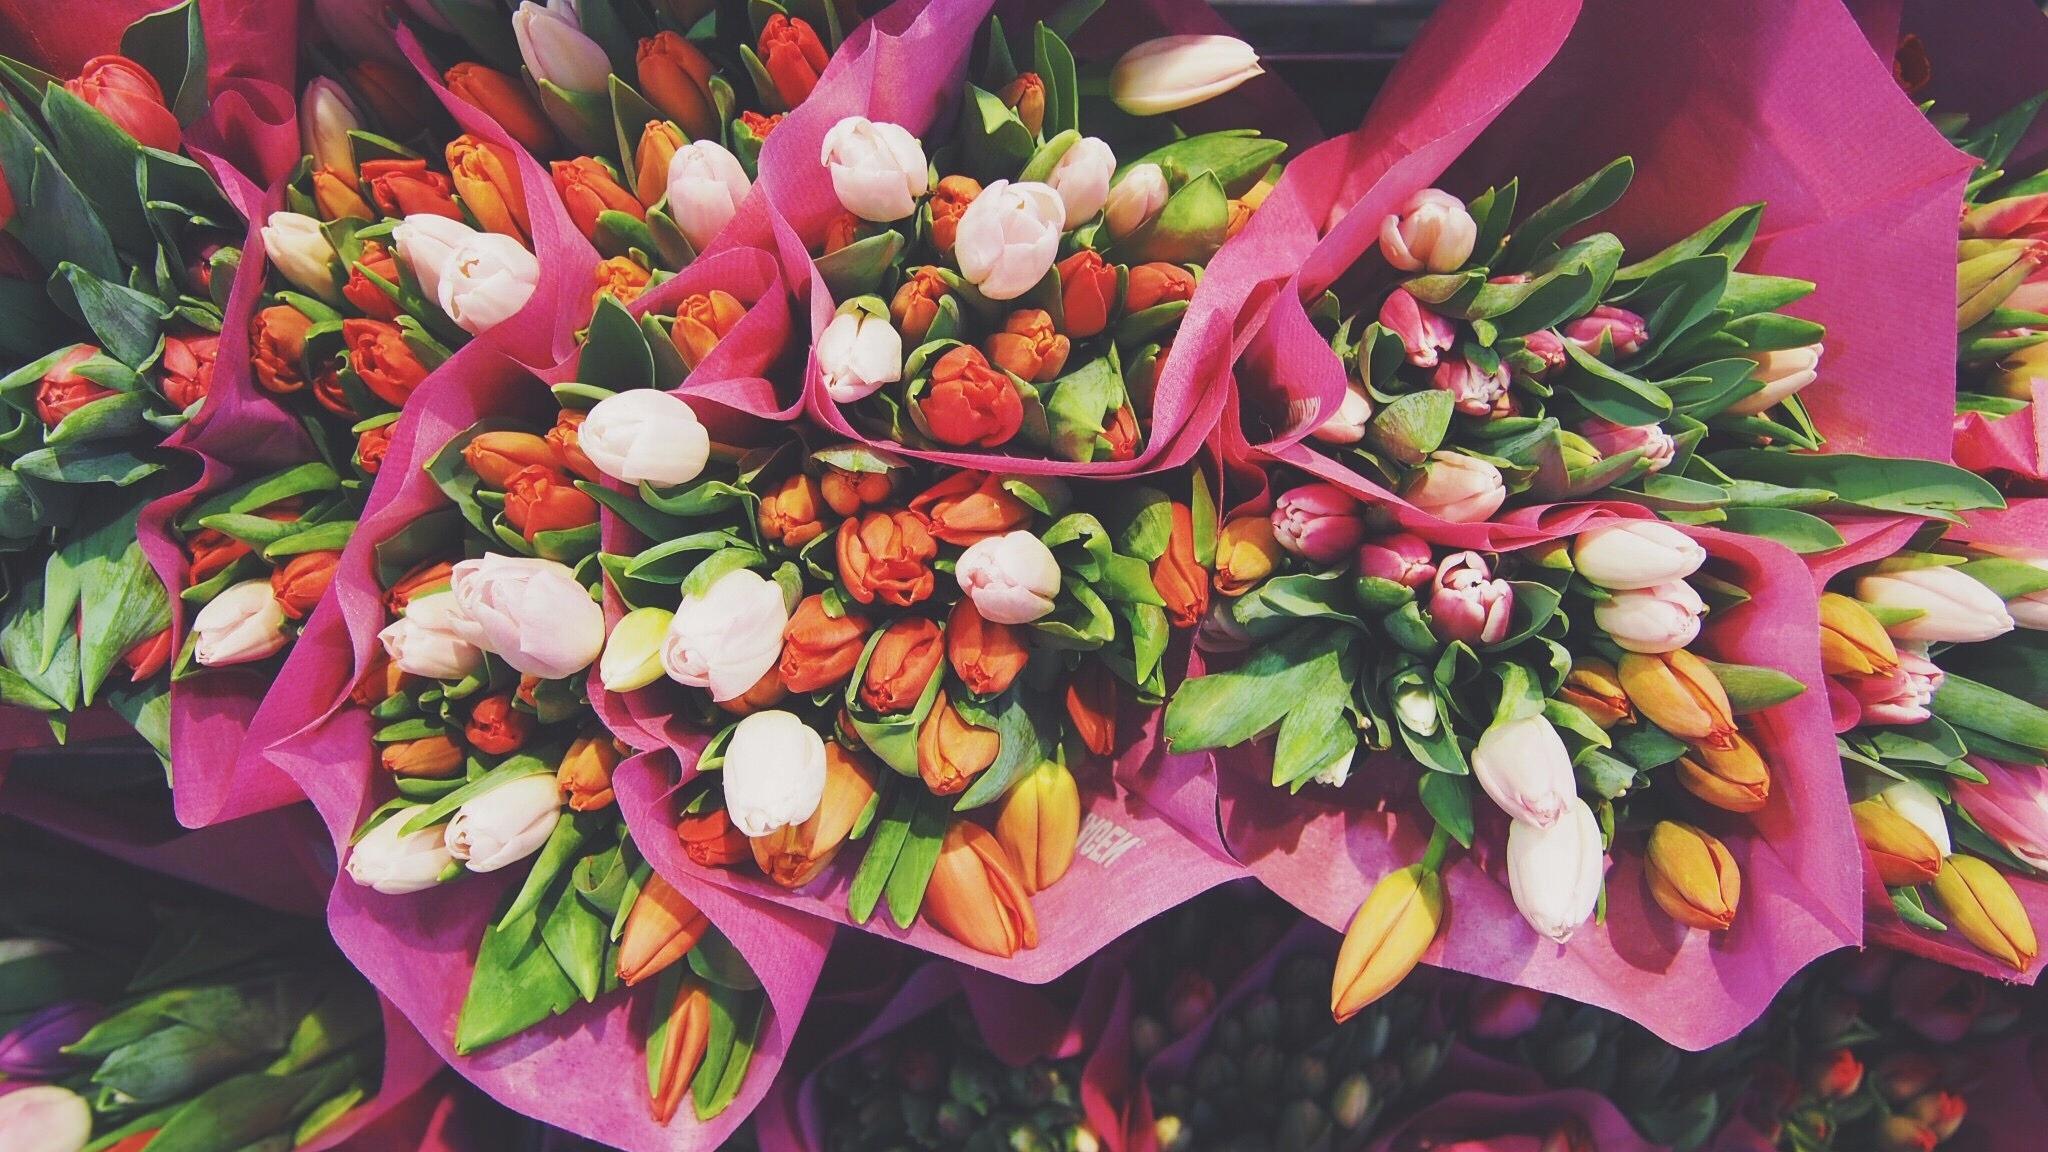 Desktop Wallpaper Tulips Flowers Bouquets Hd Image Picture Background Fio389